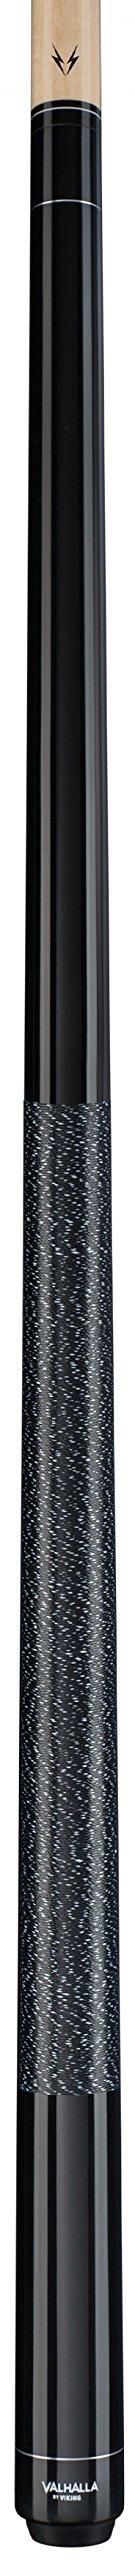 Valhalla by Viking 2 Piece Pool Cue Stick Black VA111 Irish Linen Wrap 20 oz. PLUS Rosin Bag by Valhalla (Image #4)